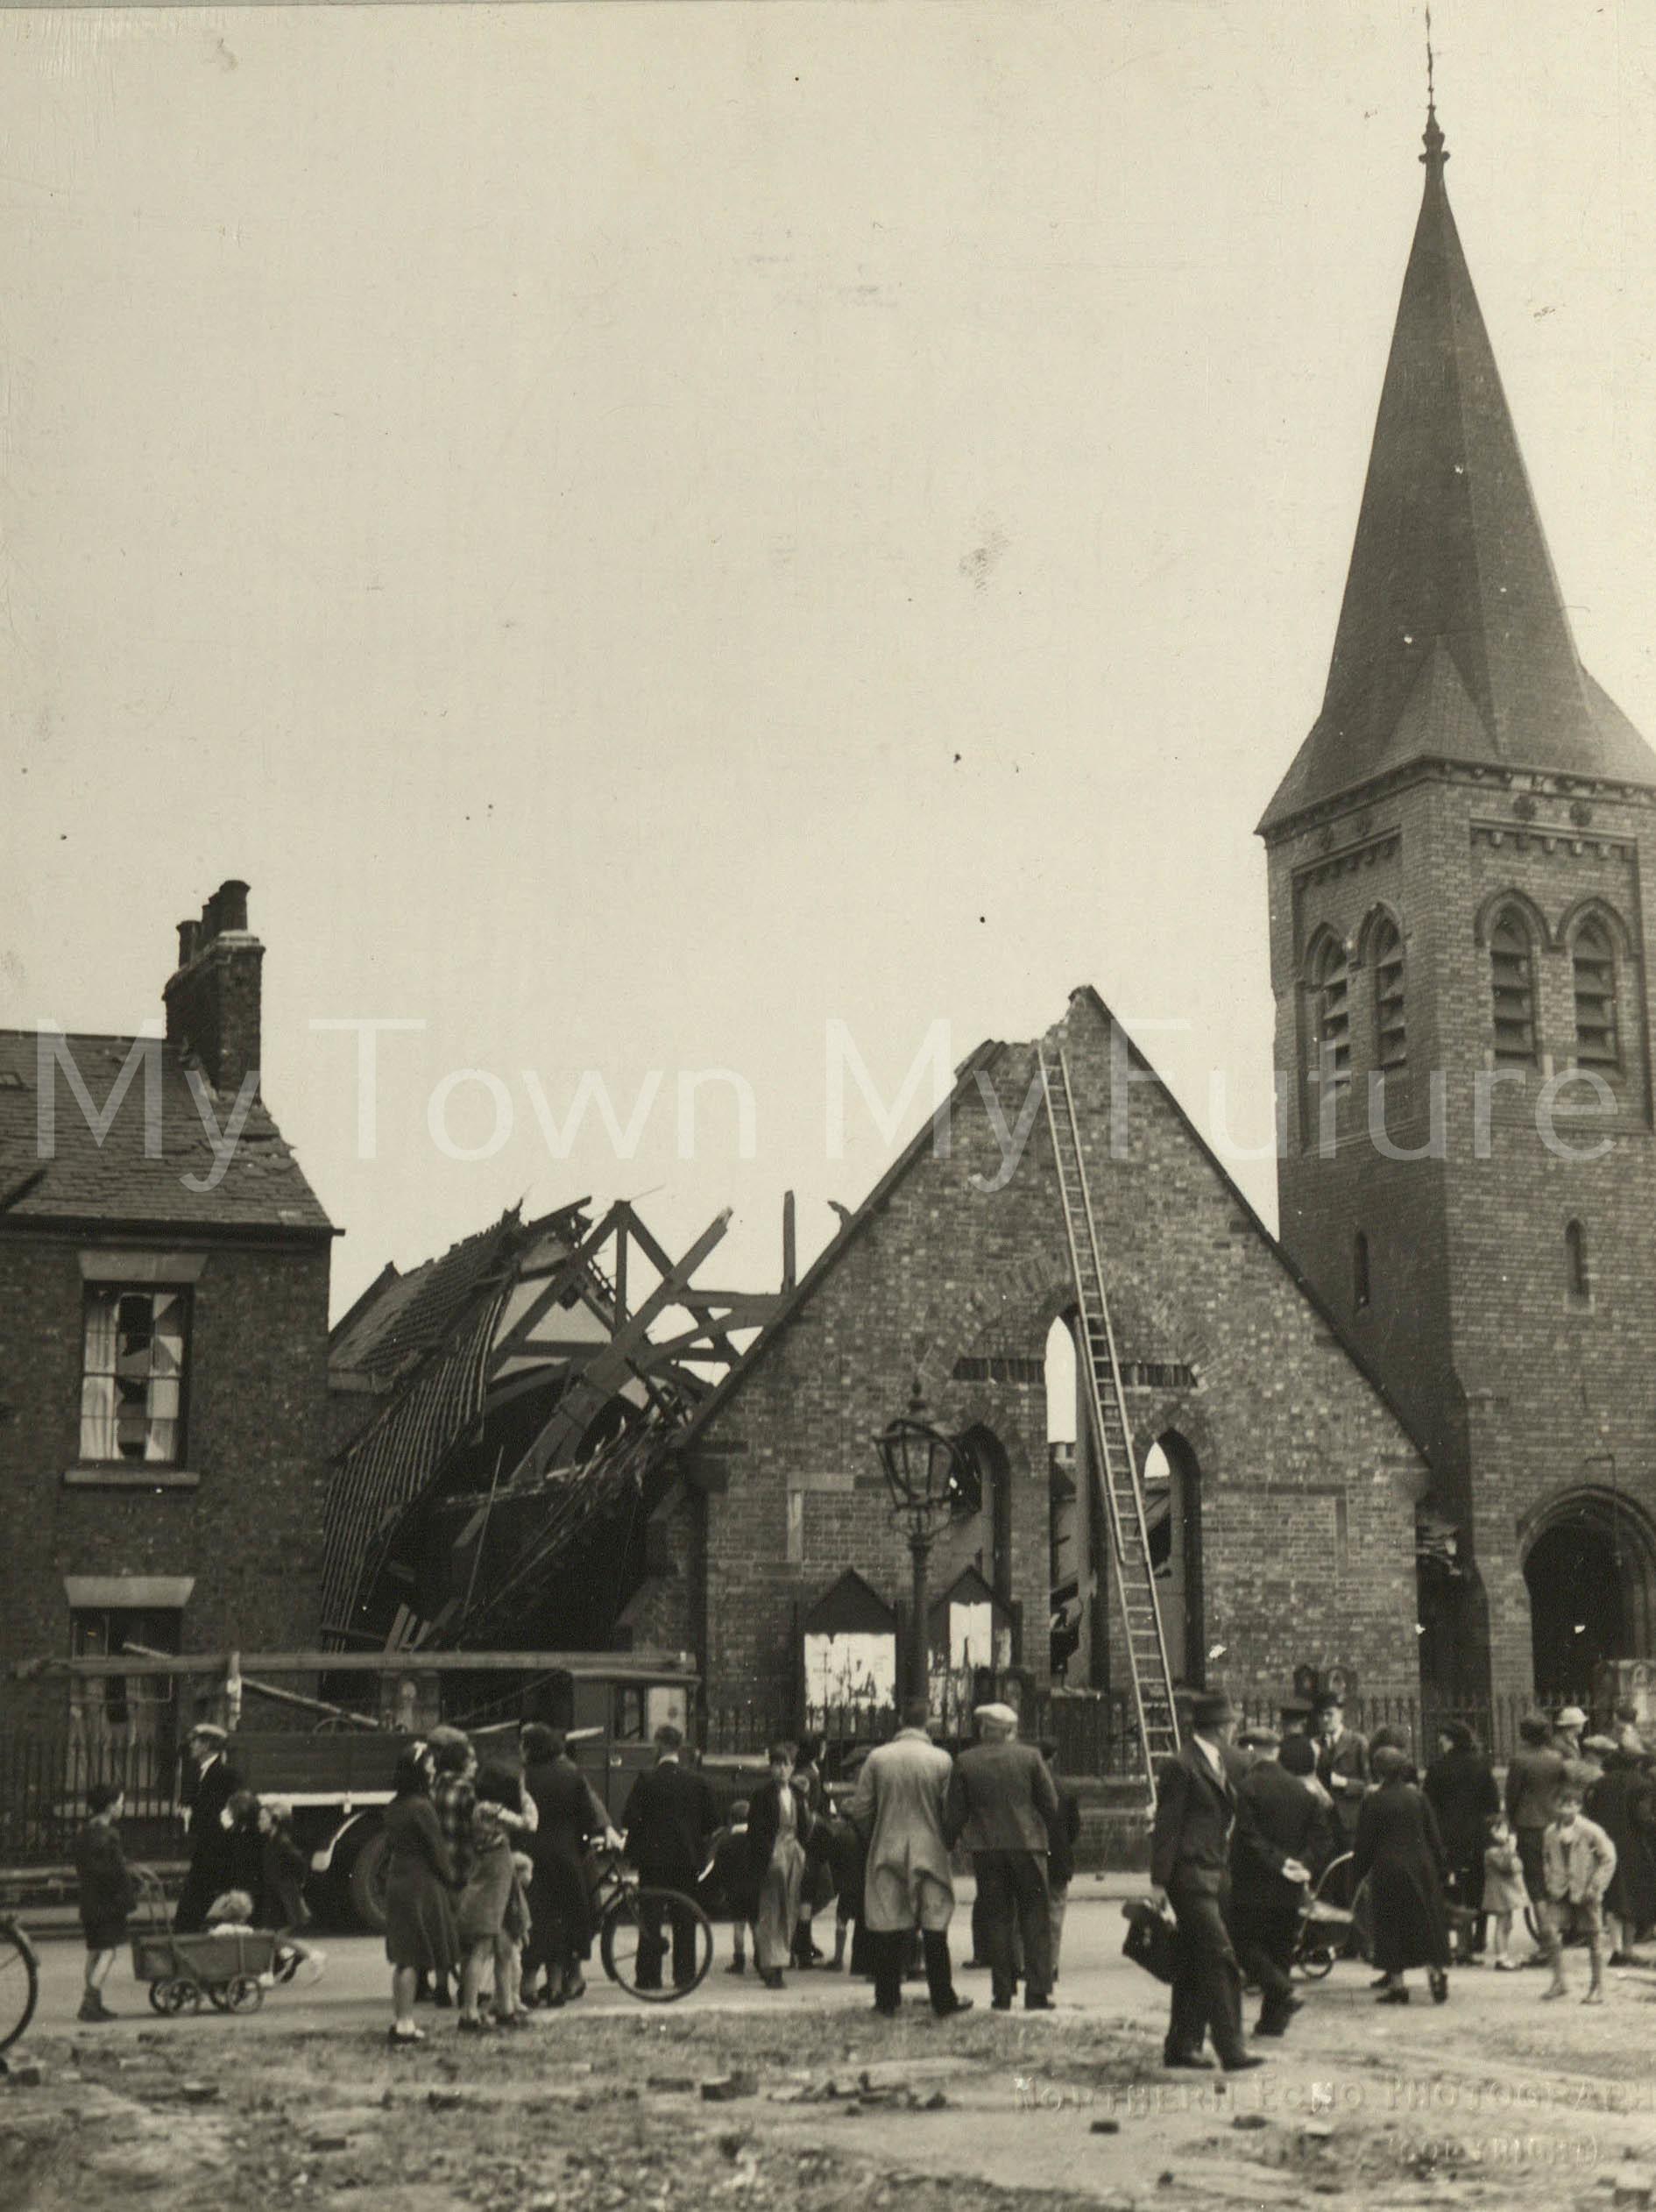 St Peter's Church - After Air Raid, 1940, Northern Echo Newspaper